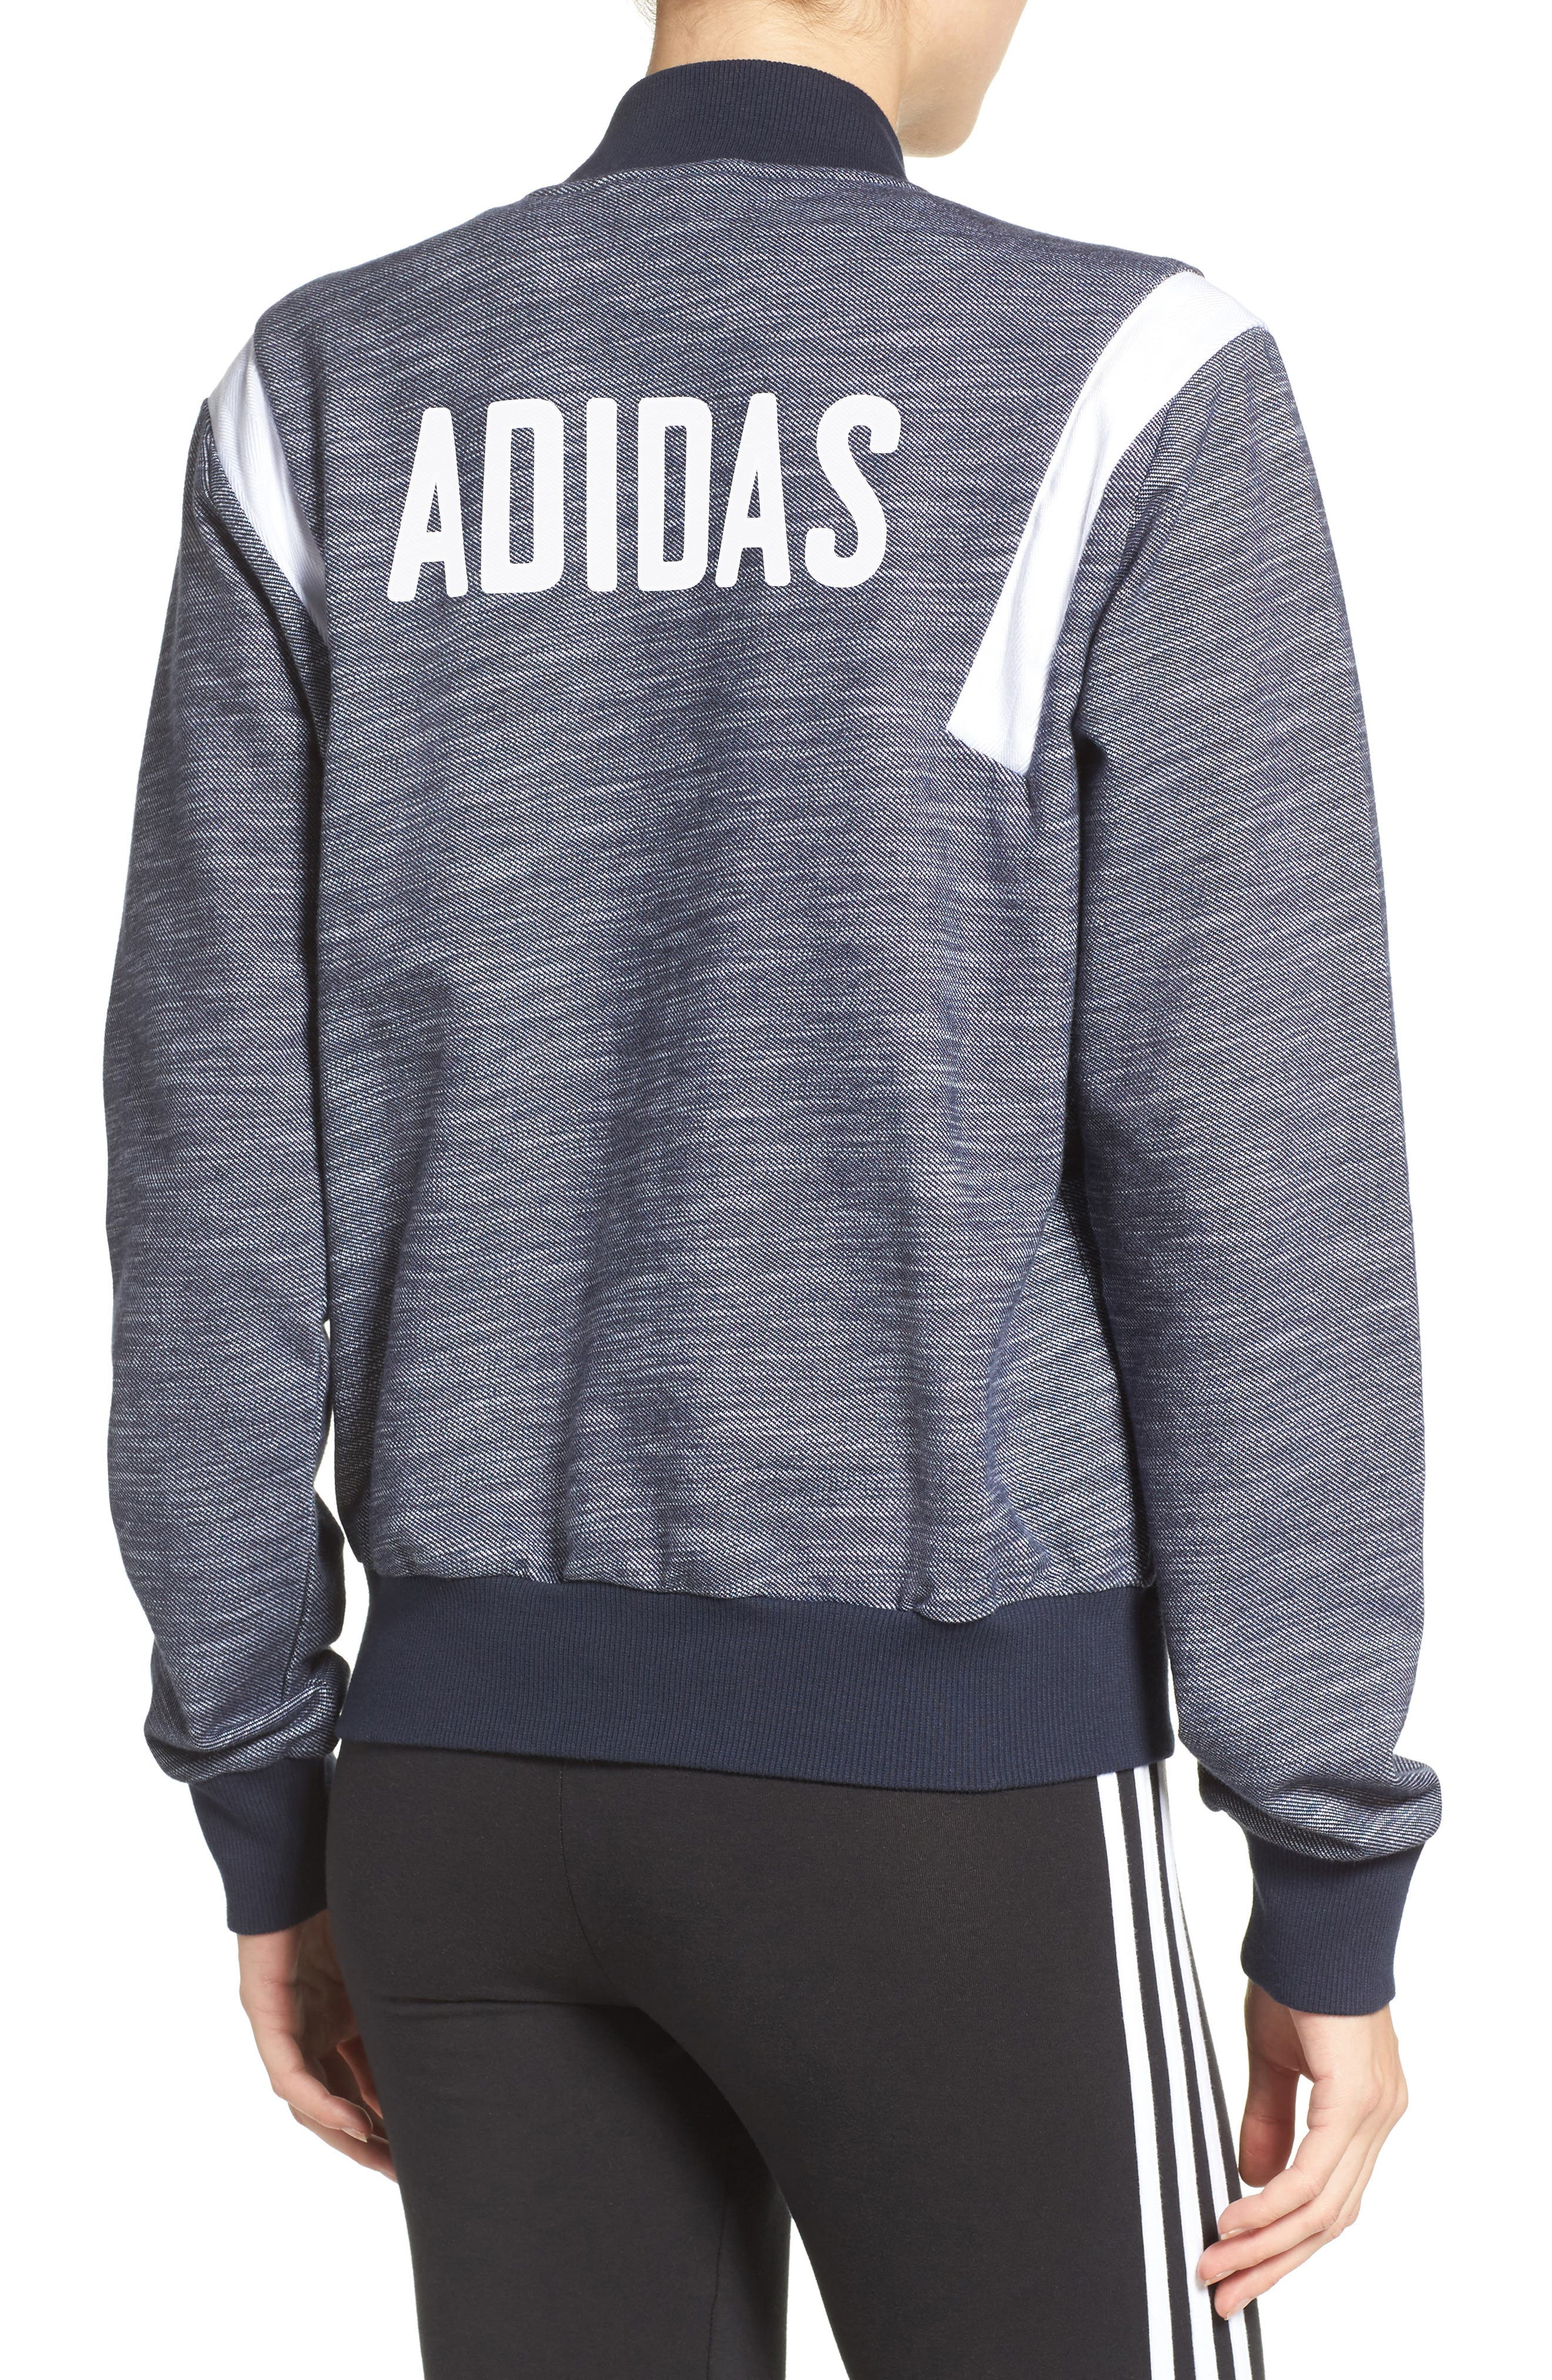 Main Image - adidas Originals Track Jacket